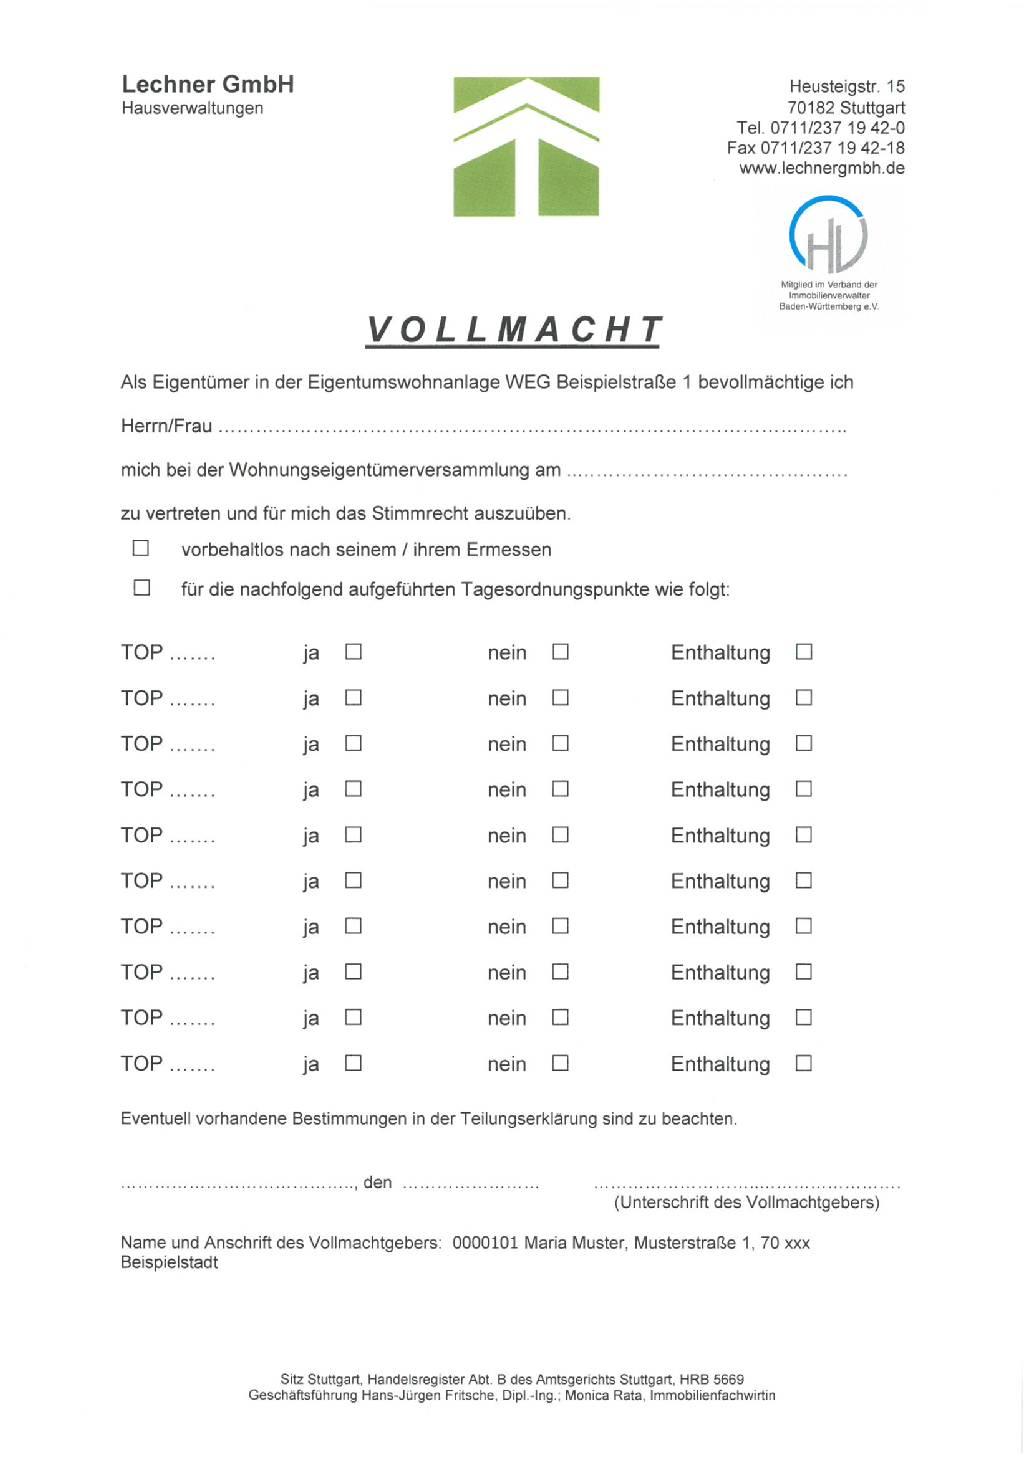 Old Fashioned Tagesordnung Vorlage Für Word Picture Collection ...